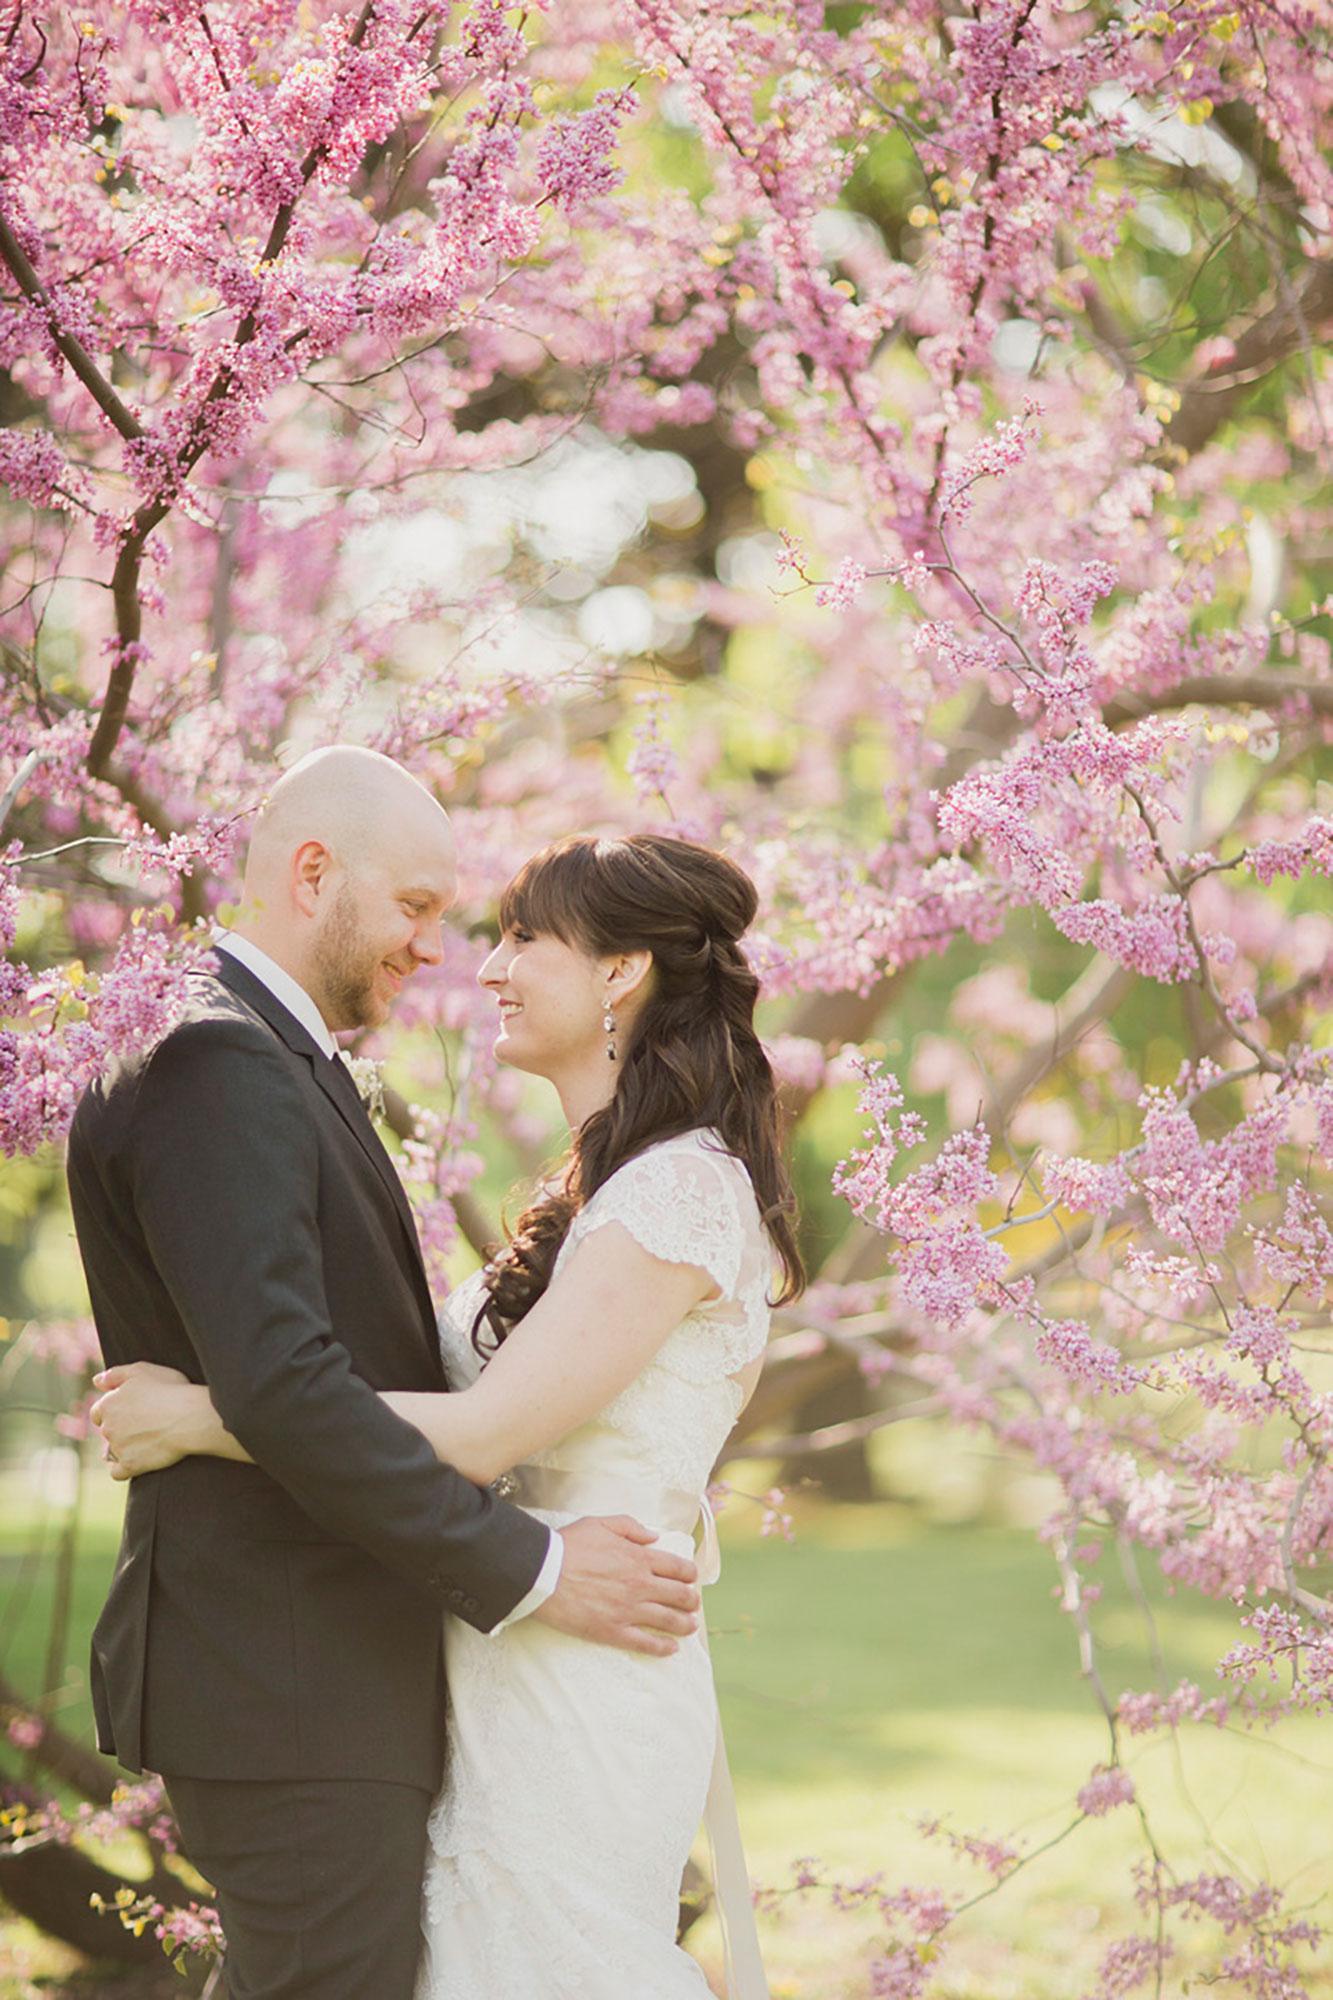 Balls-Falls-Vineyard-Bride-Photo-By-Elizabeth-in-Love-020.jpg